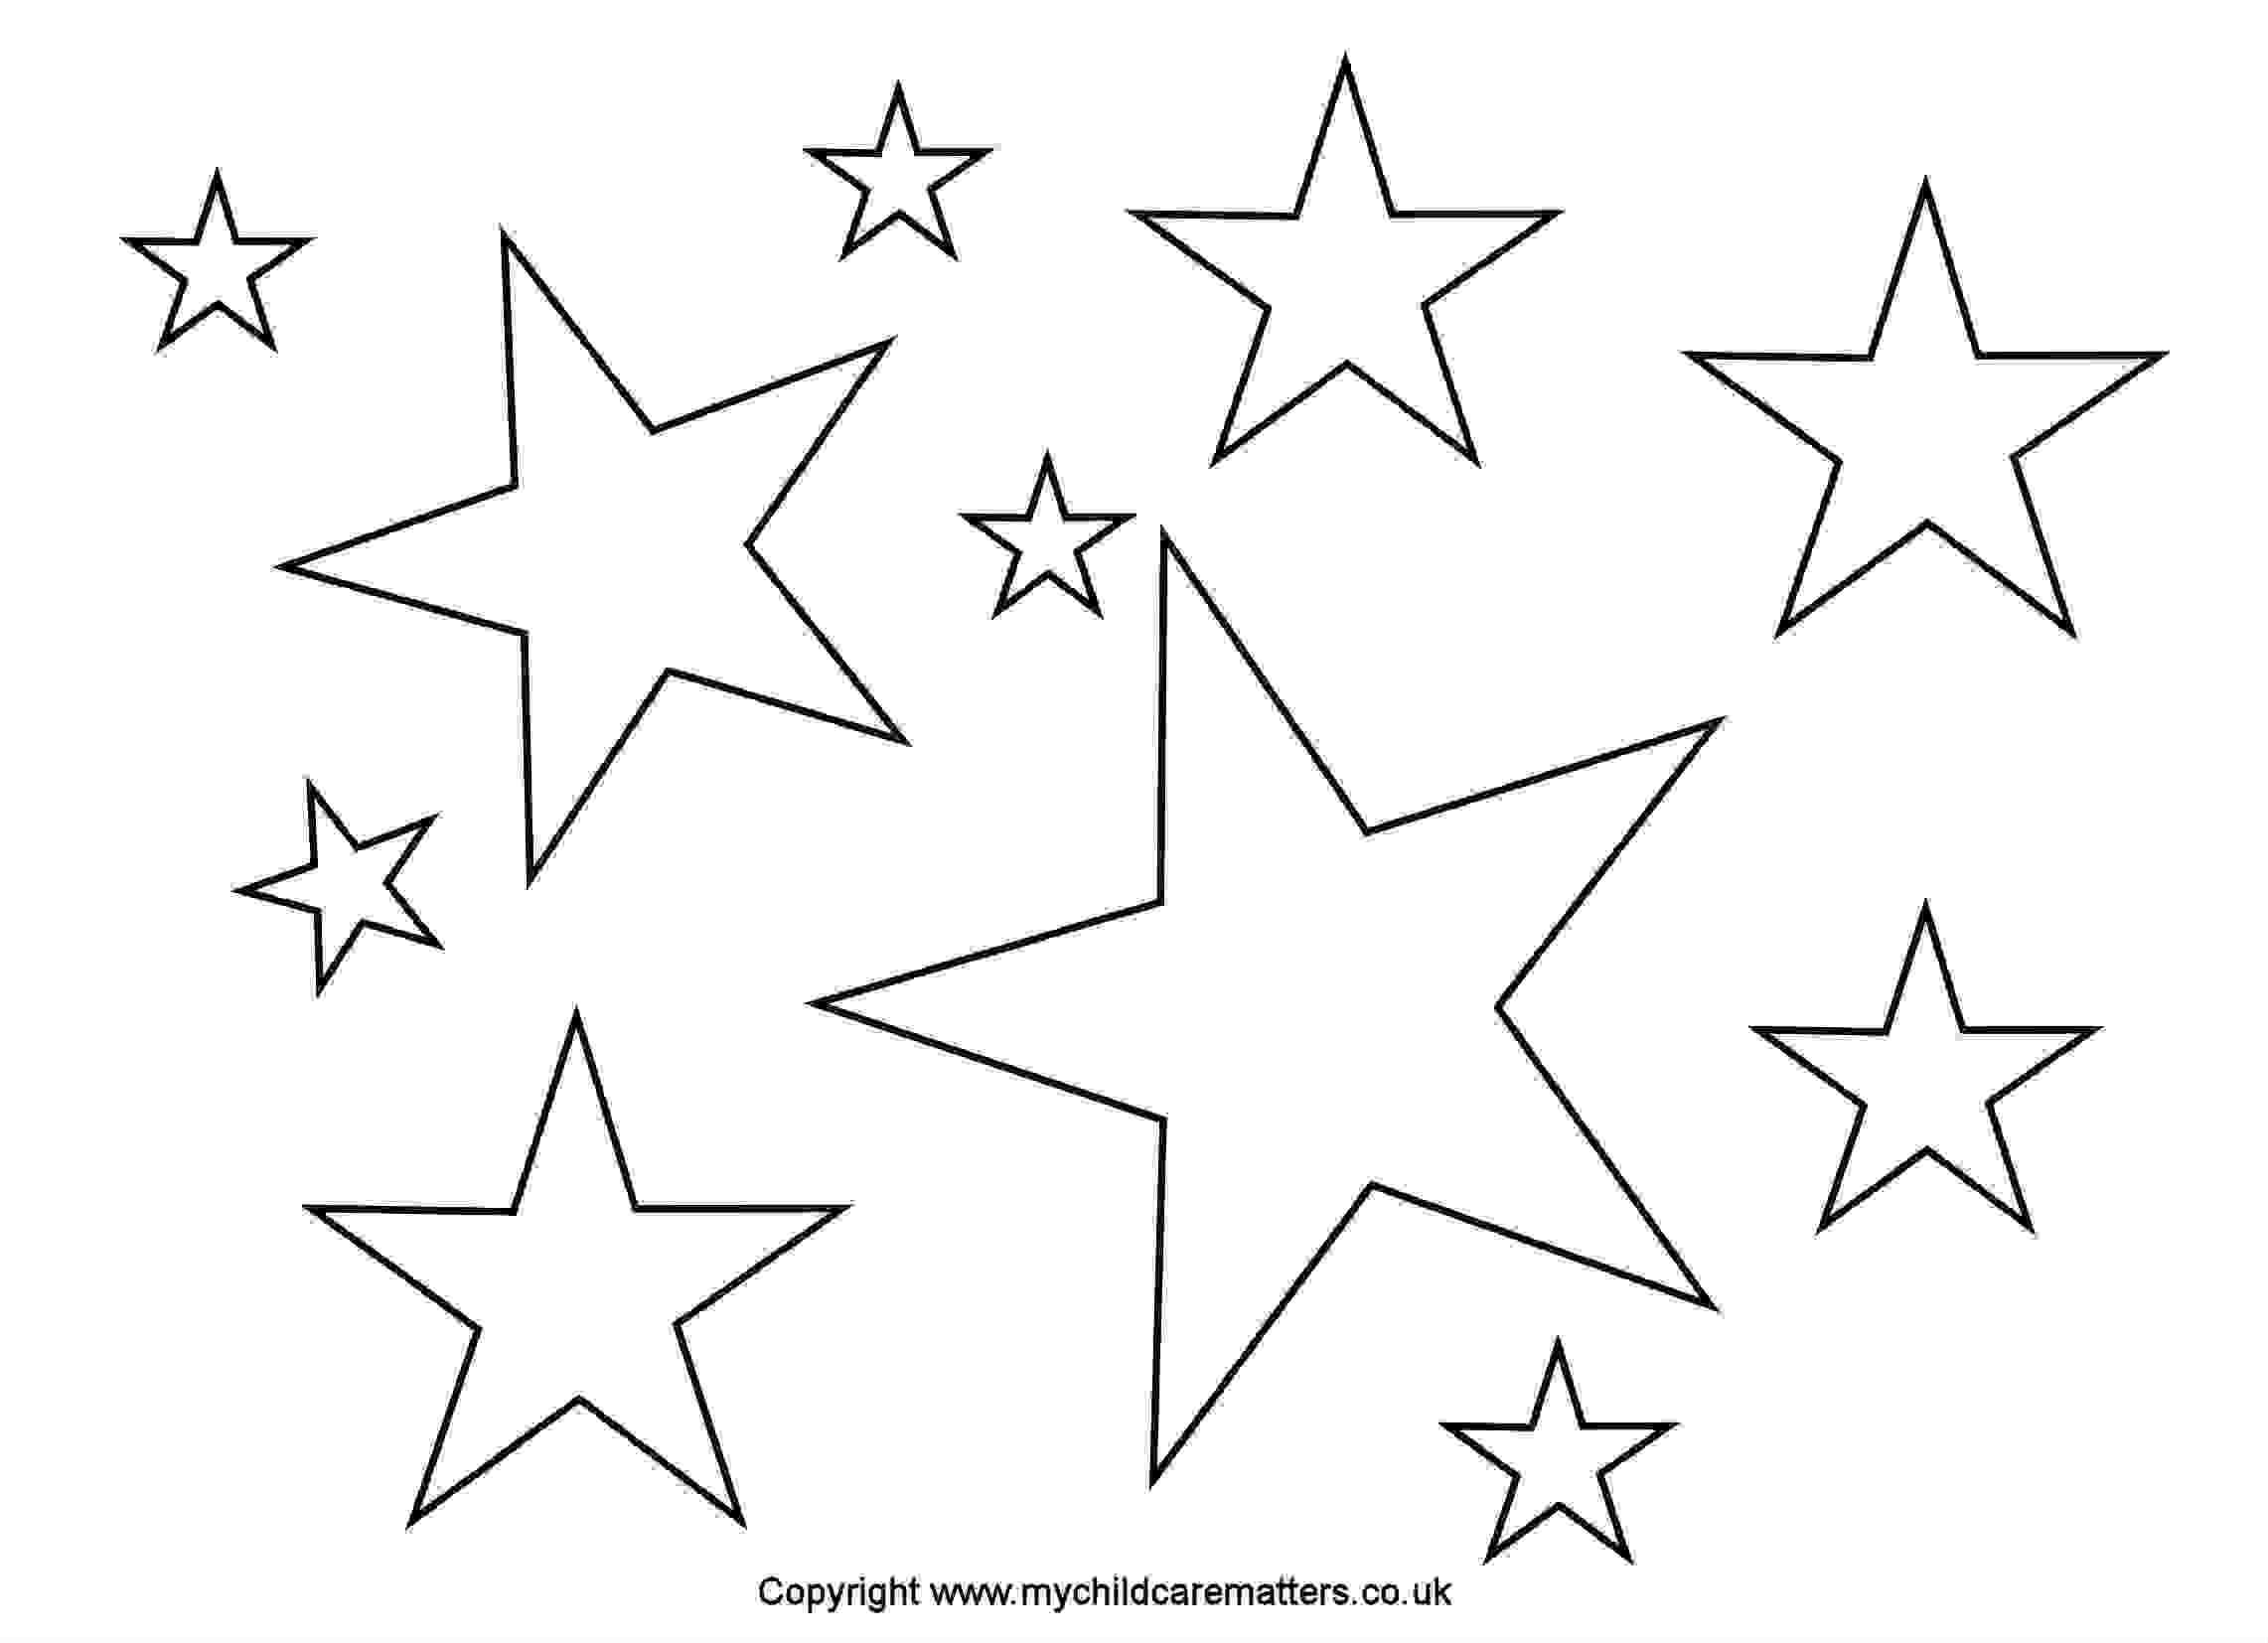 Star outline images stars outline greeting cards black background 2283x1654